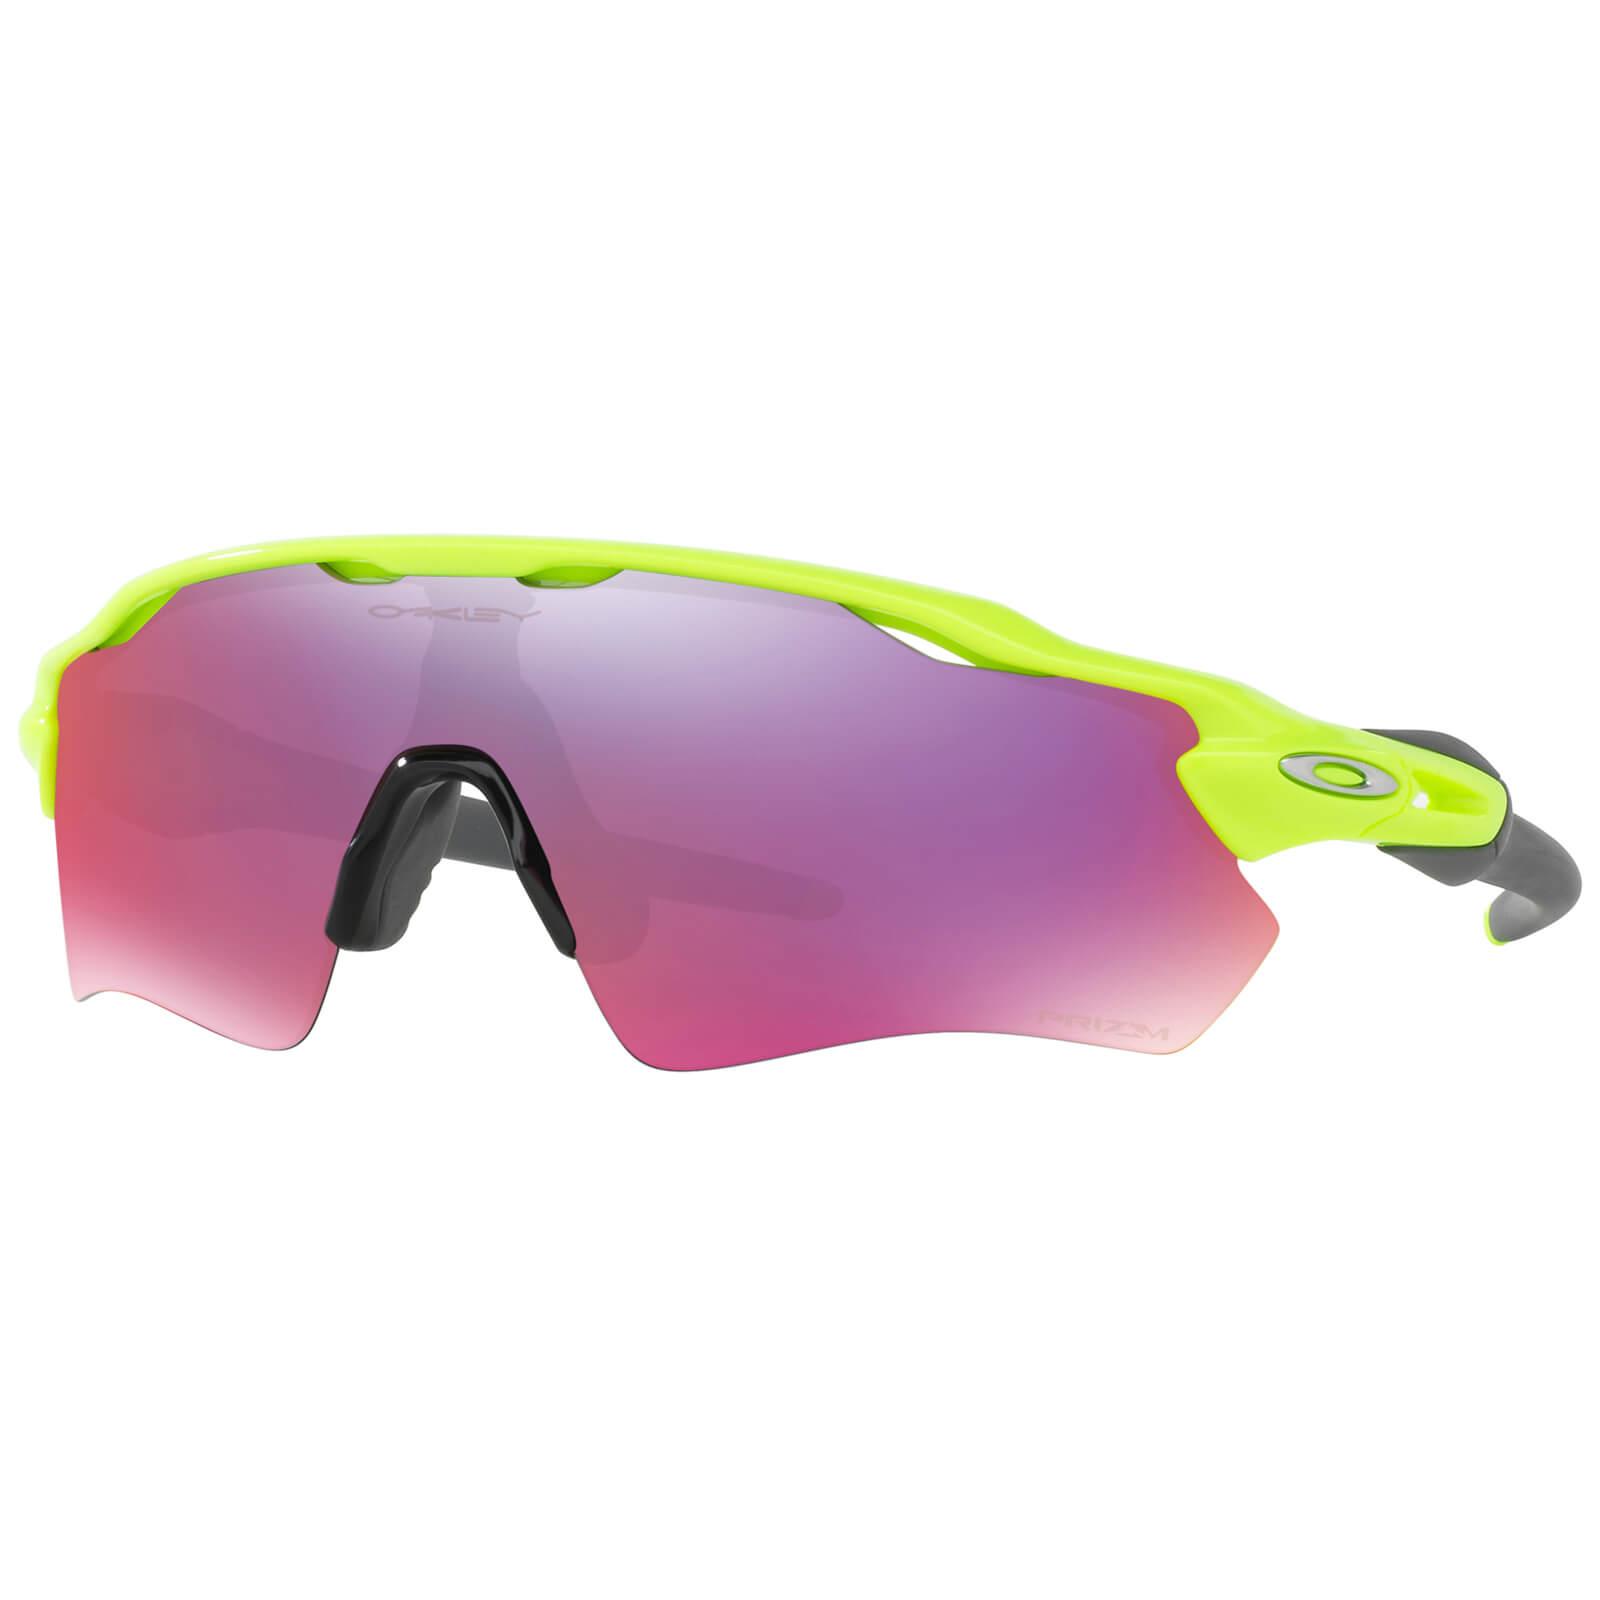 Oakley Radar EV Path Sunglasses - Retina Burn/Prizm Road